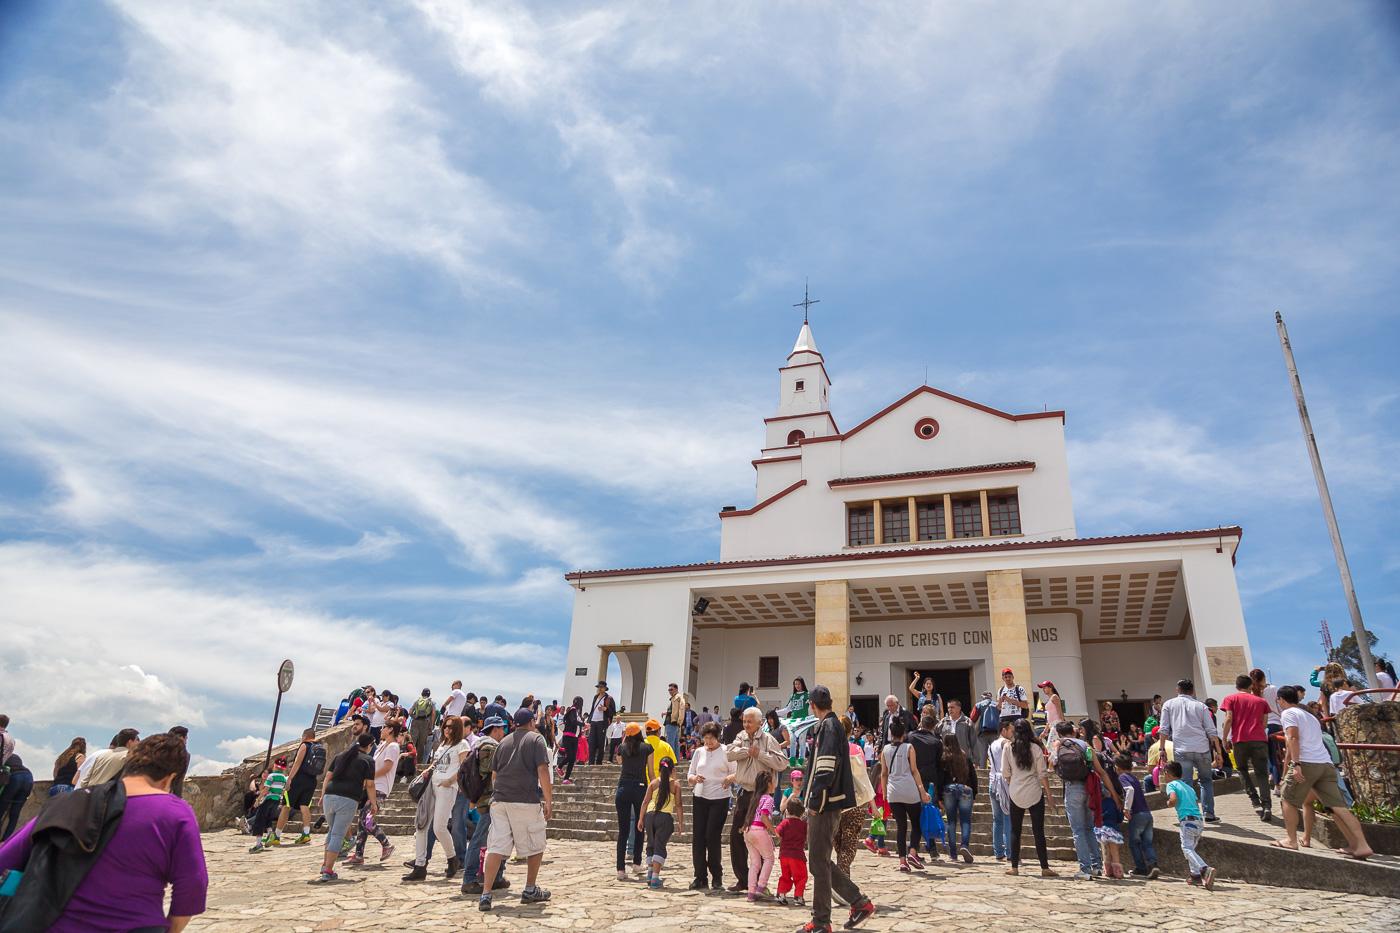 Bogota - Montserrate Hike (18 of 18) May 15